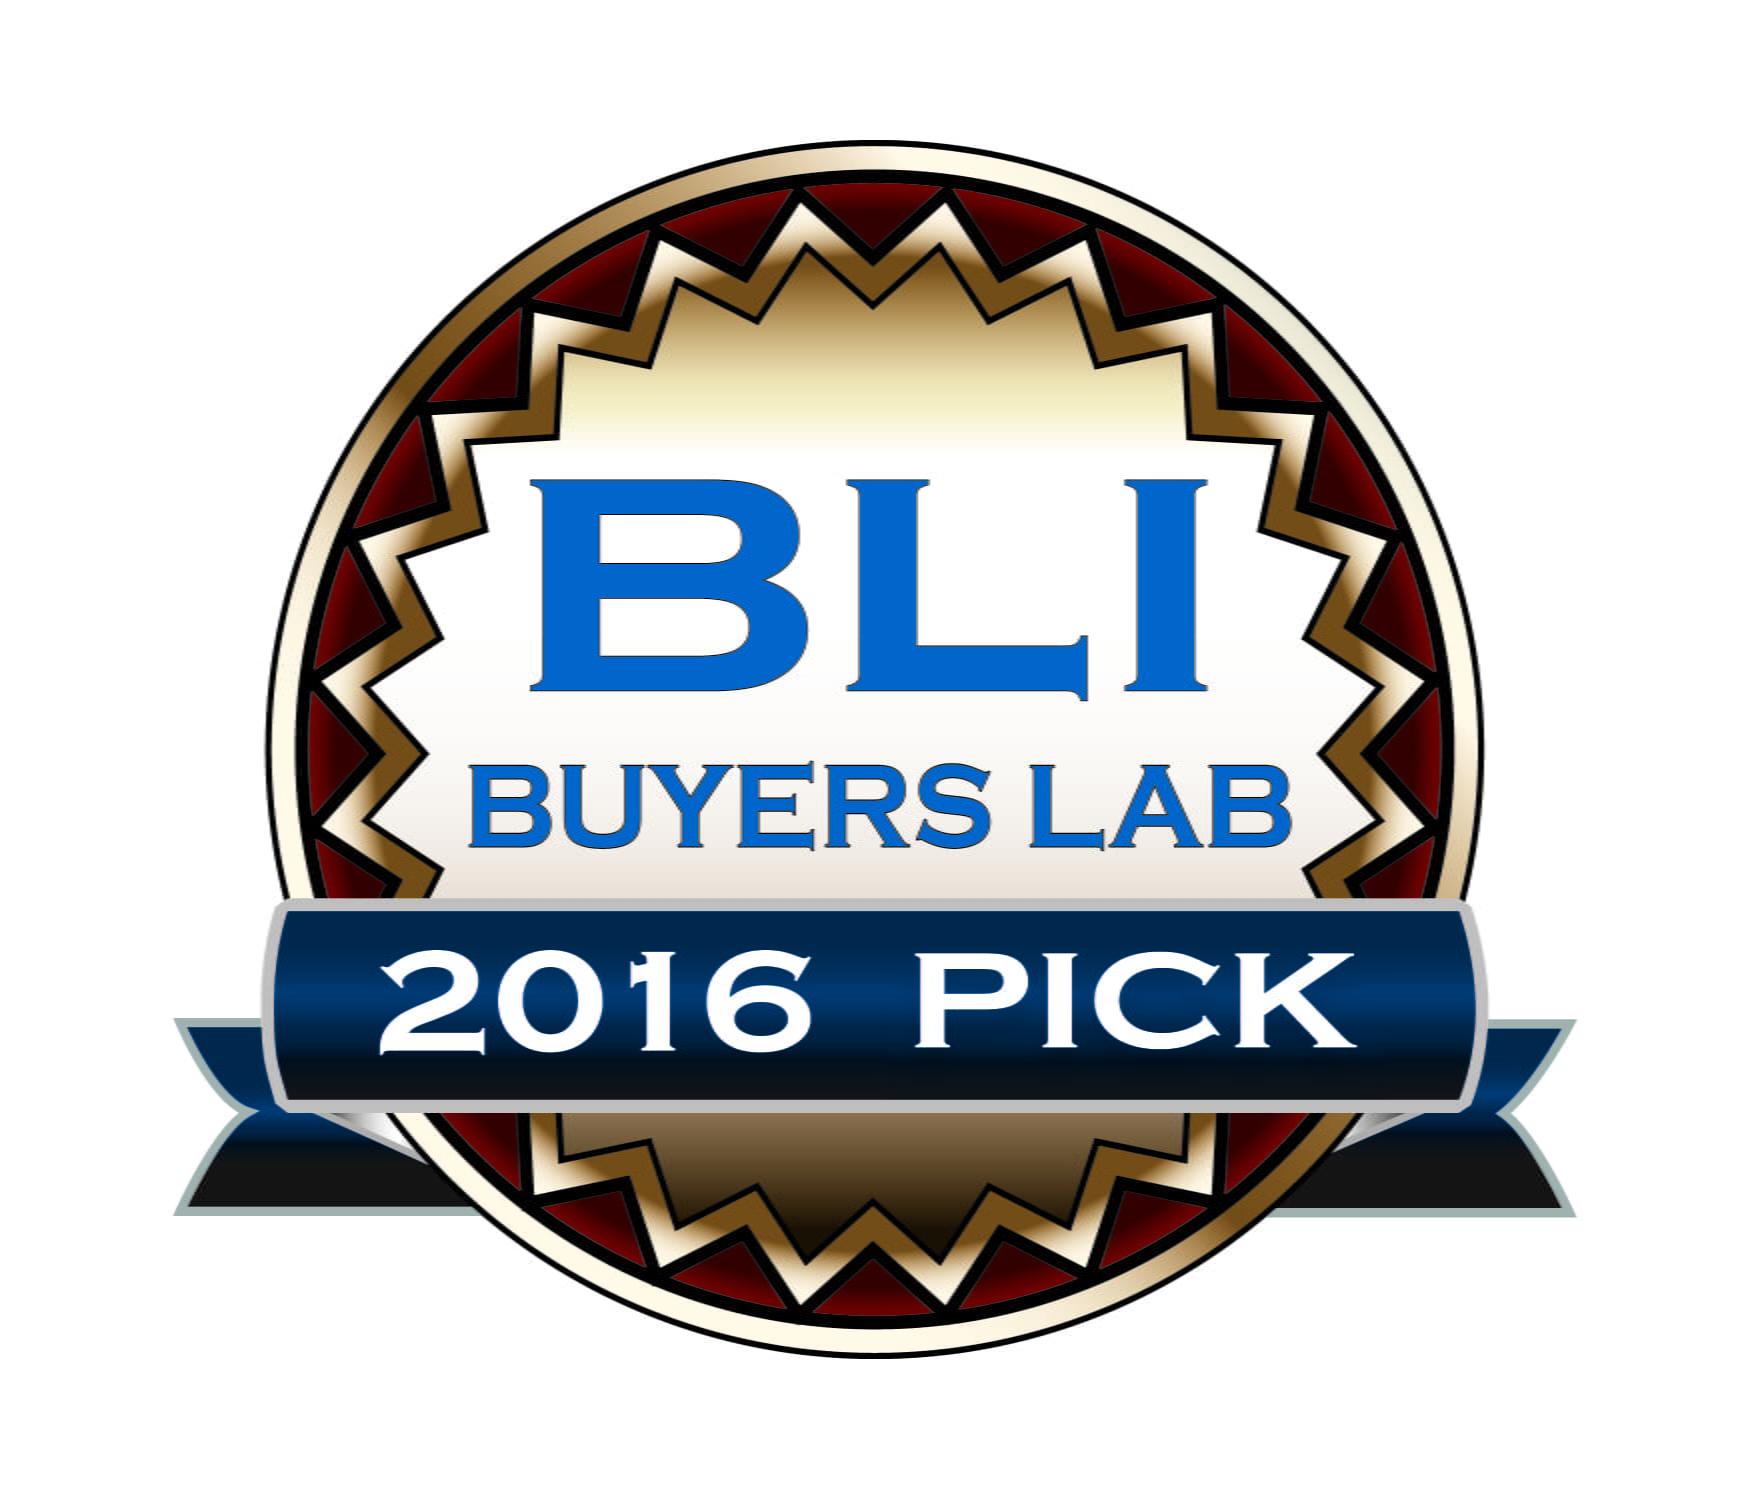 Logotyp BLI Buyers Lab 2016